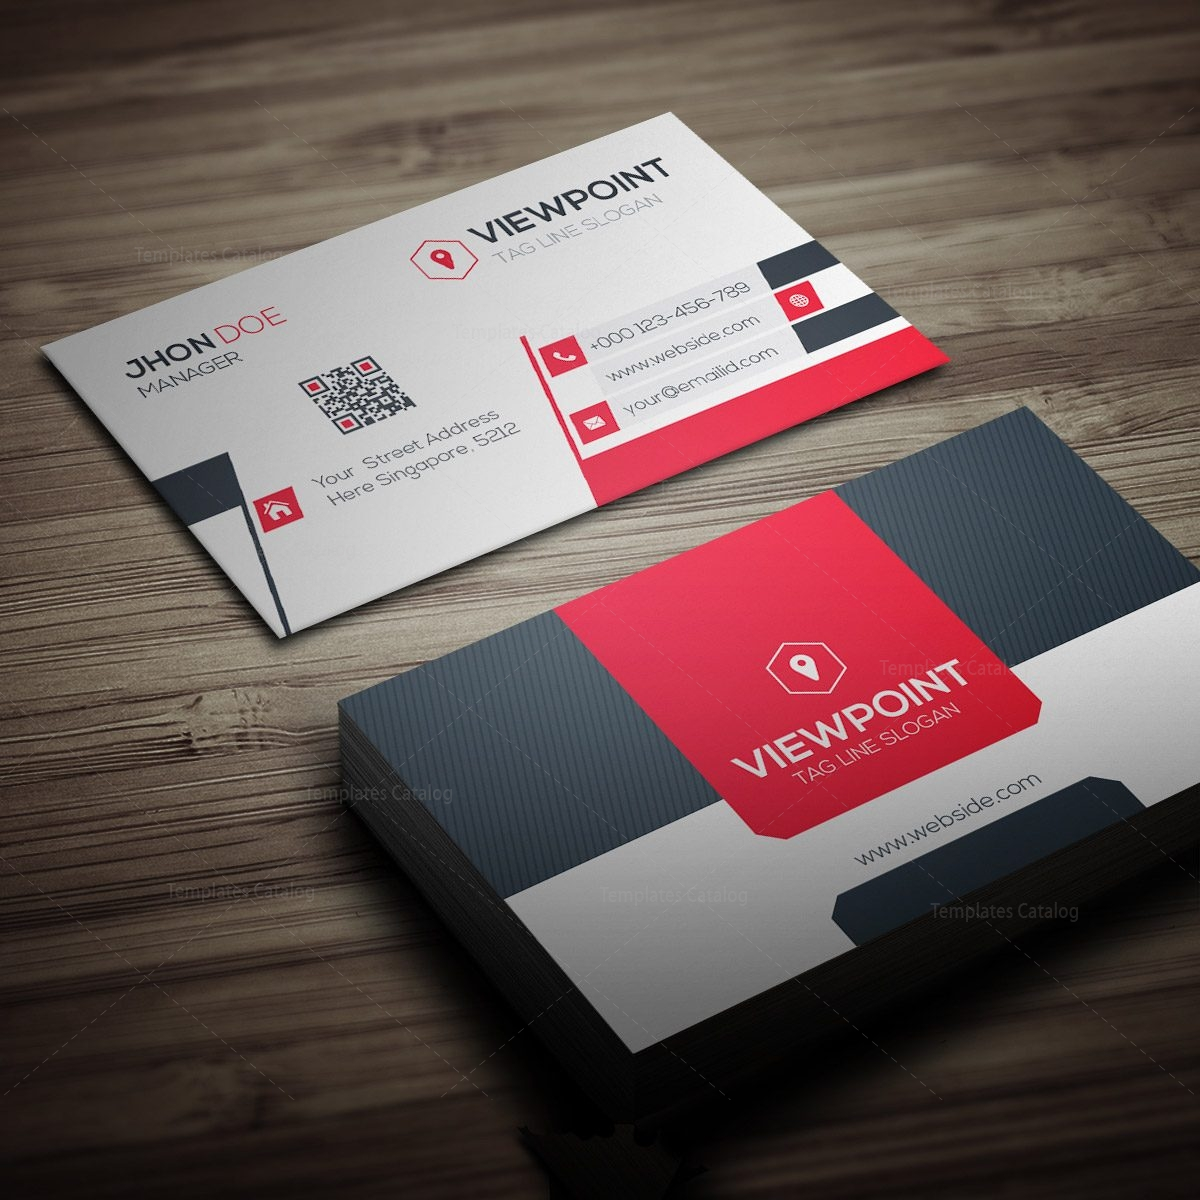 market business card template 000274 template catalog